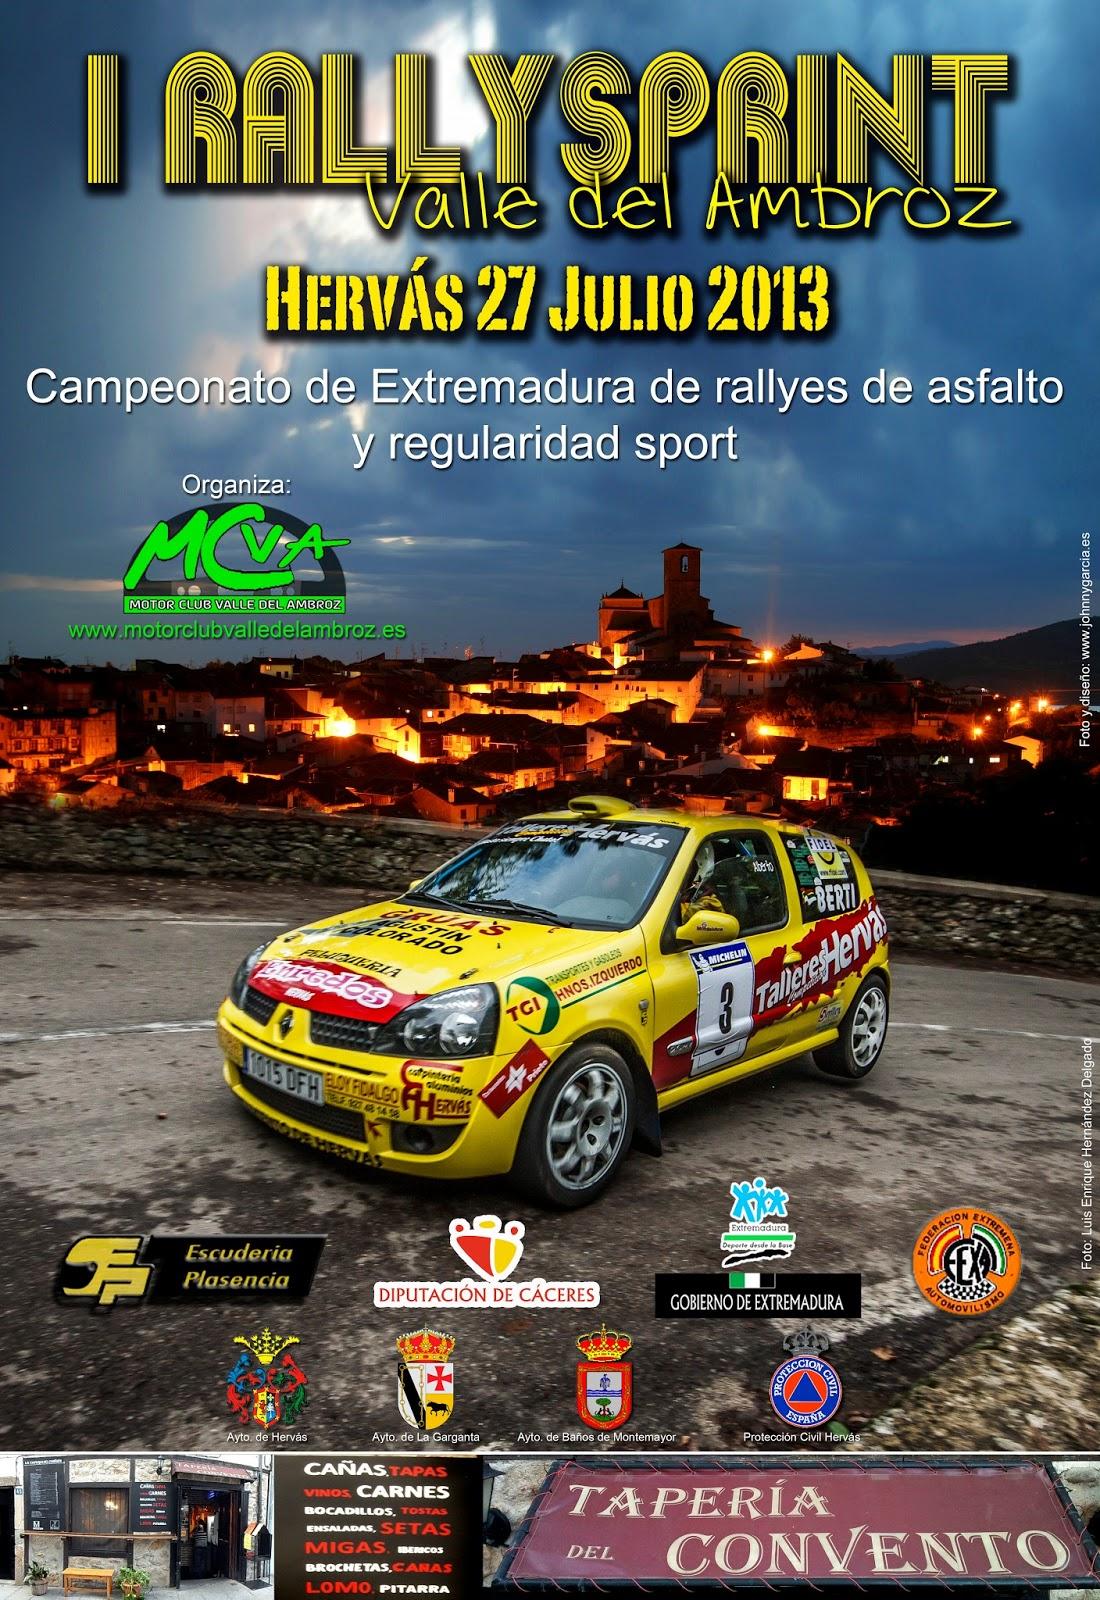 [EXTREMADURA] I Rallysprint Valle del Ambroz [27 Julio] Cartel+I+Rally+Esprint+ok